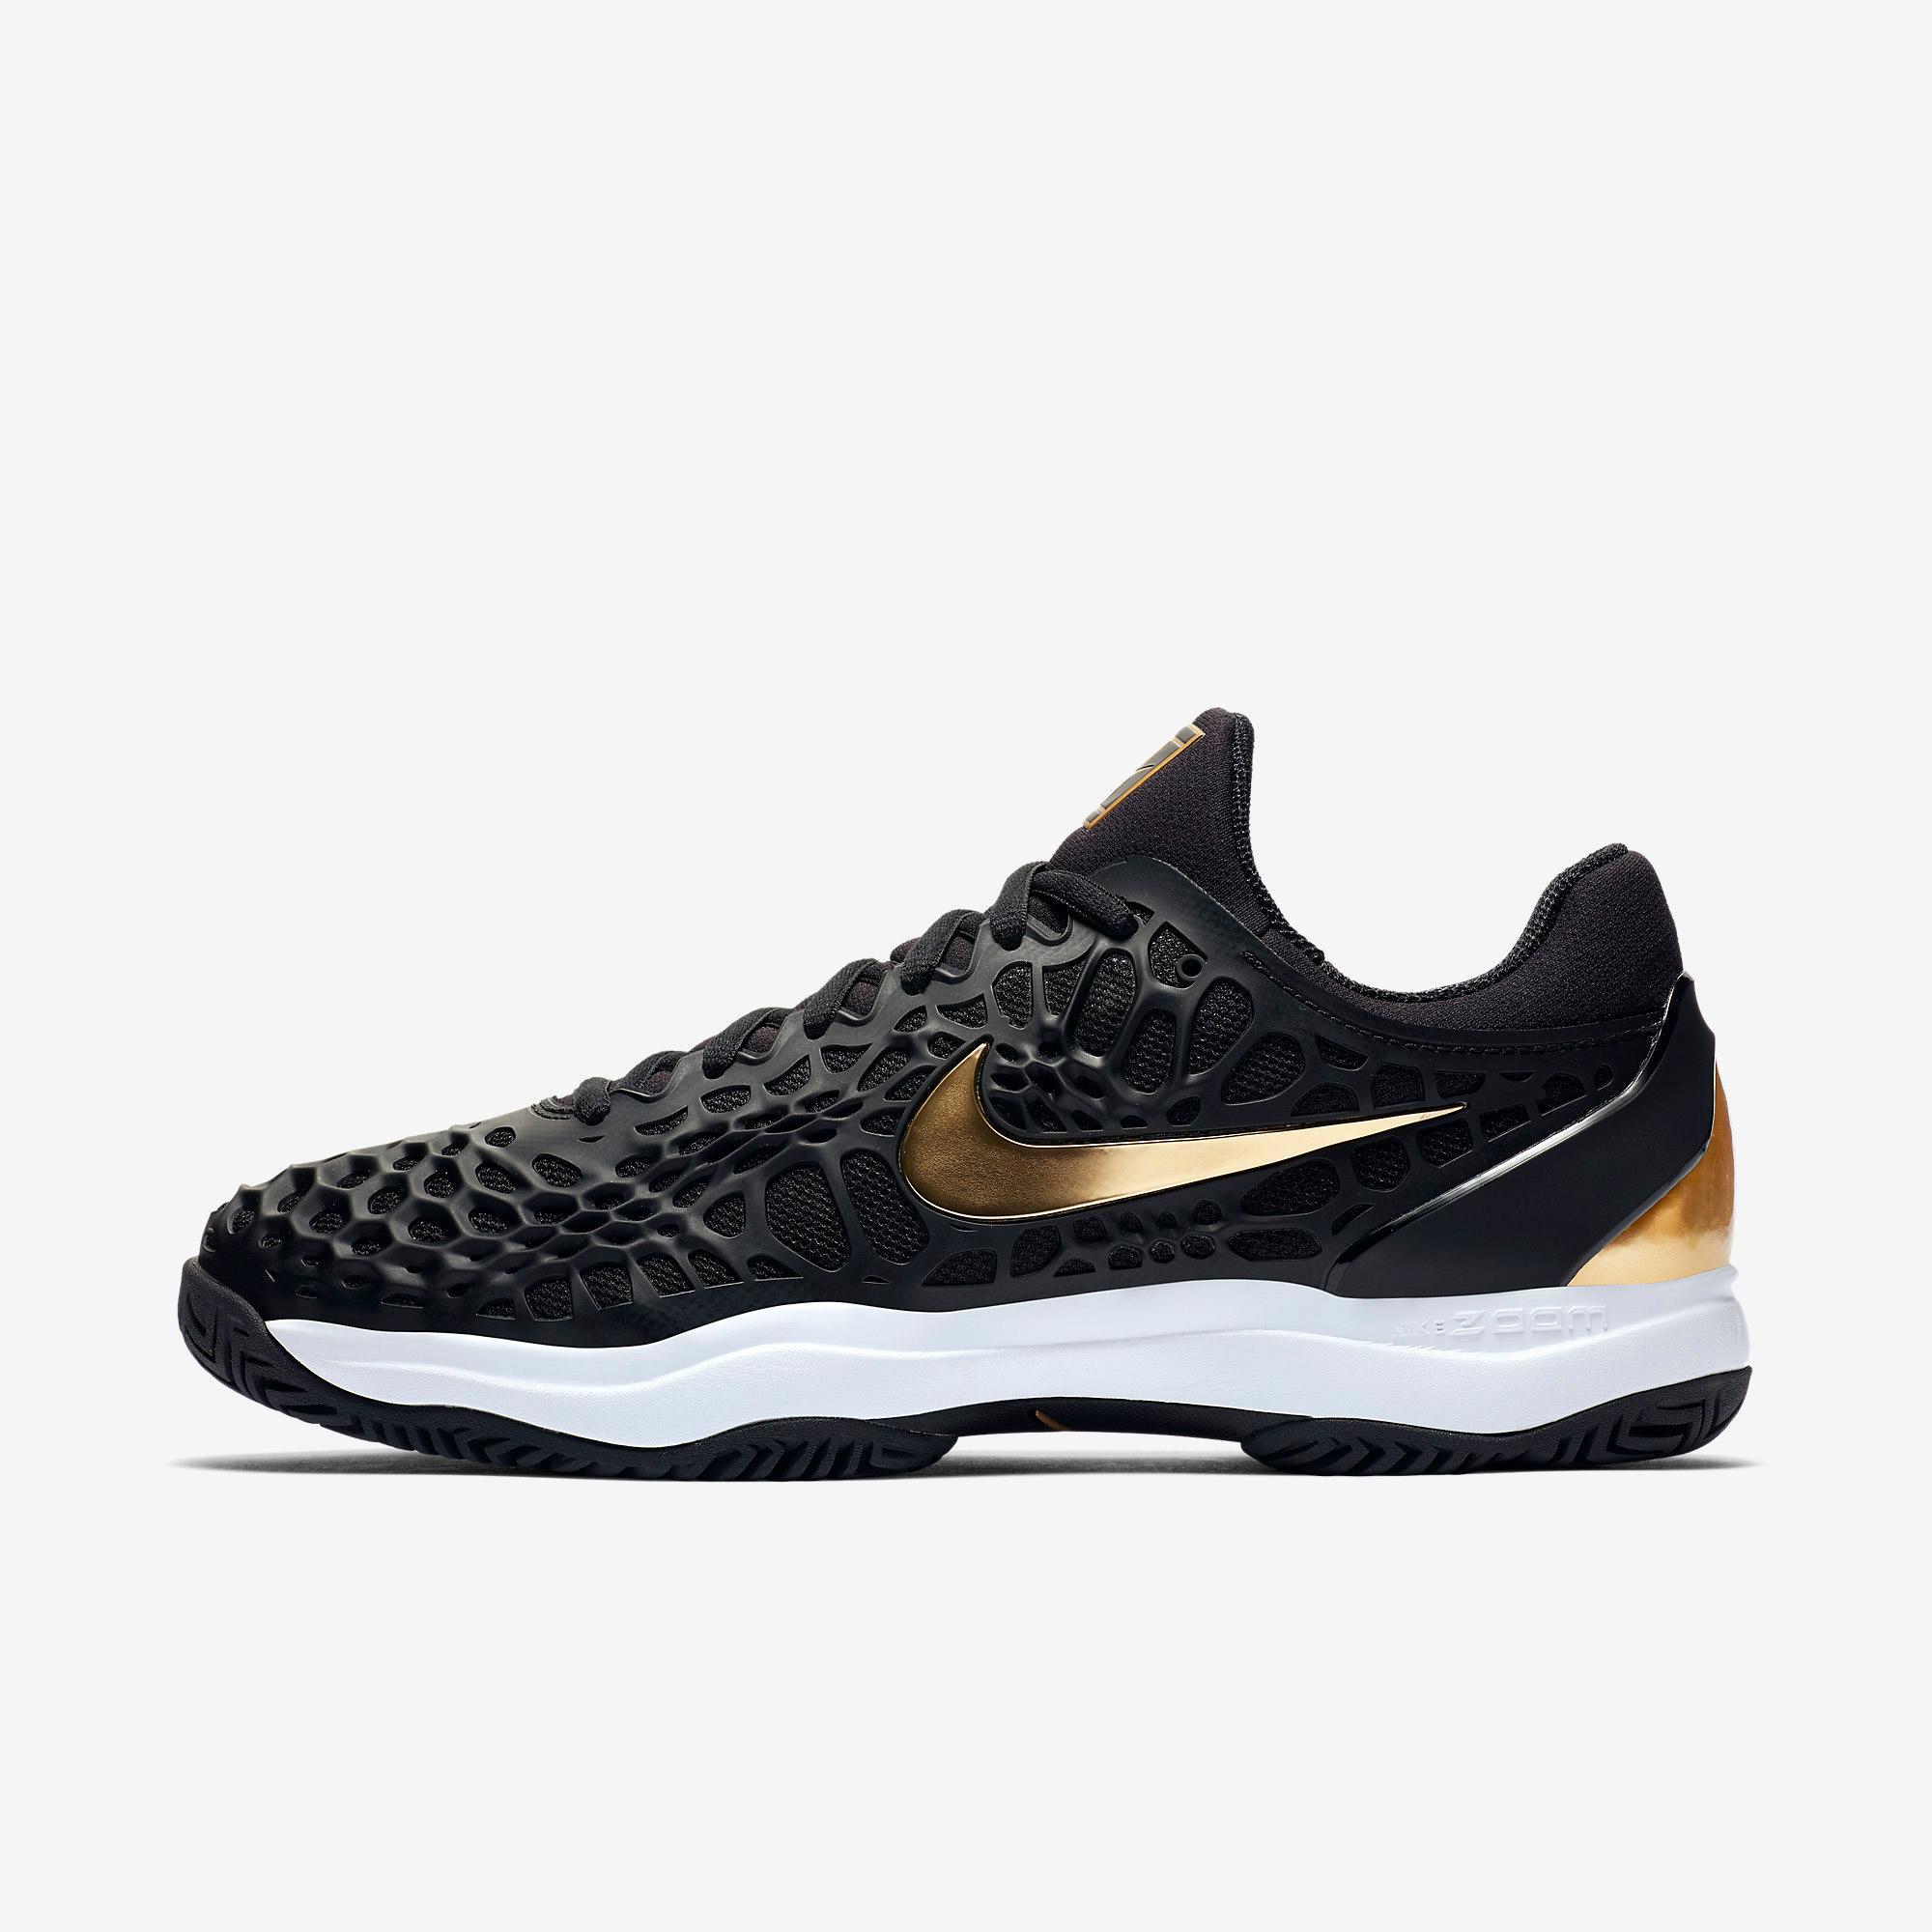 Nike Mens Zoom Cage 3 Tennis Shoes - Black/Metallic Gold